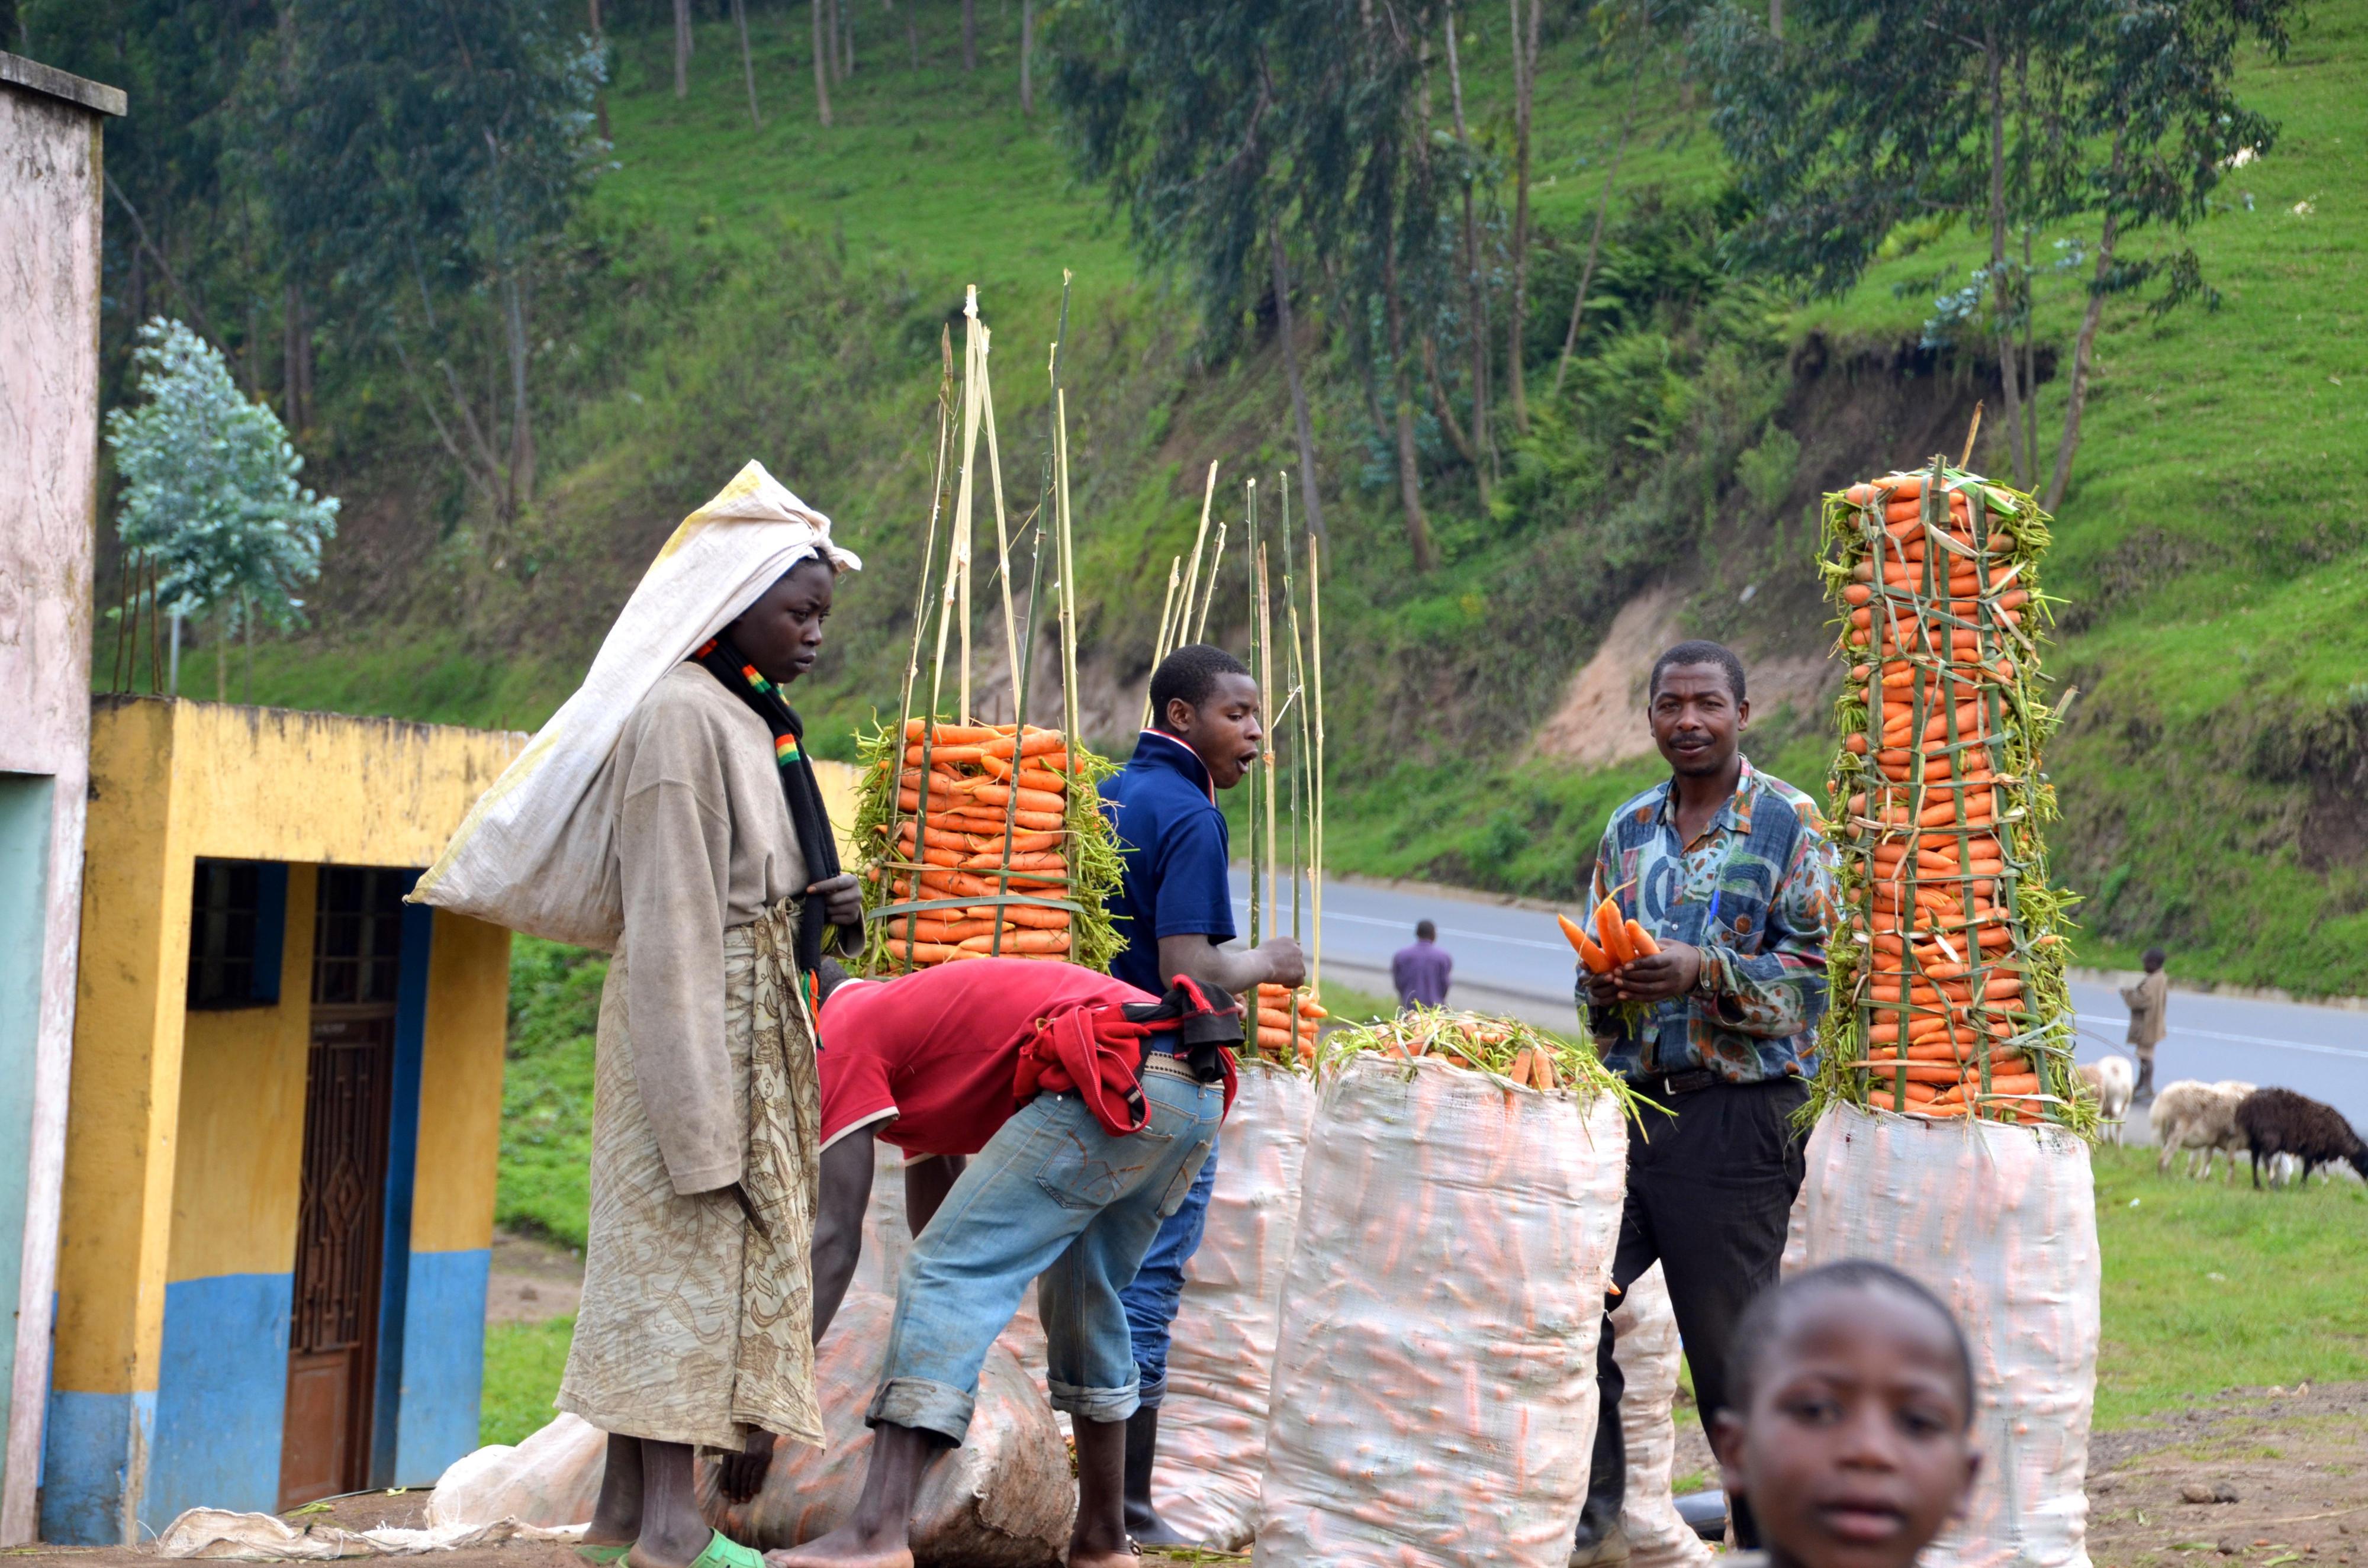 Straßenstand in Ruanda, an dem Karotten verkauft werden